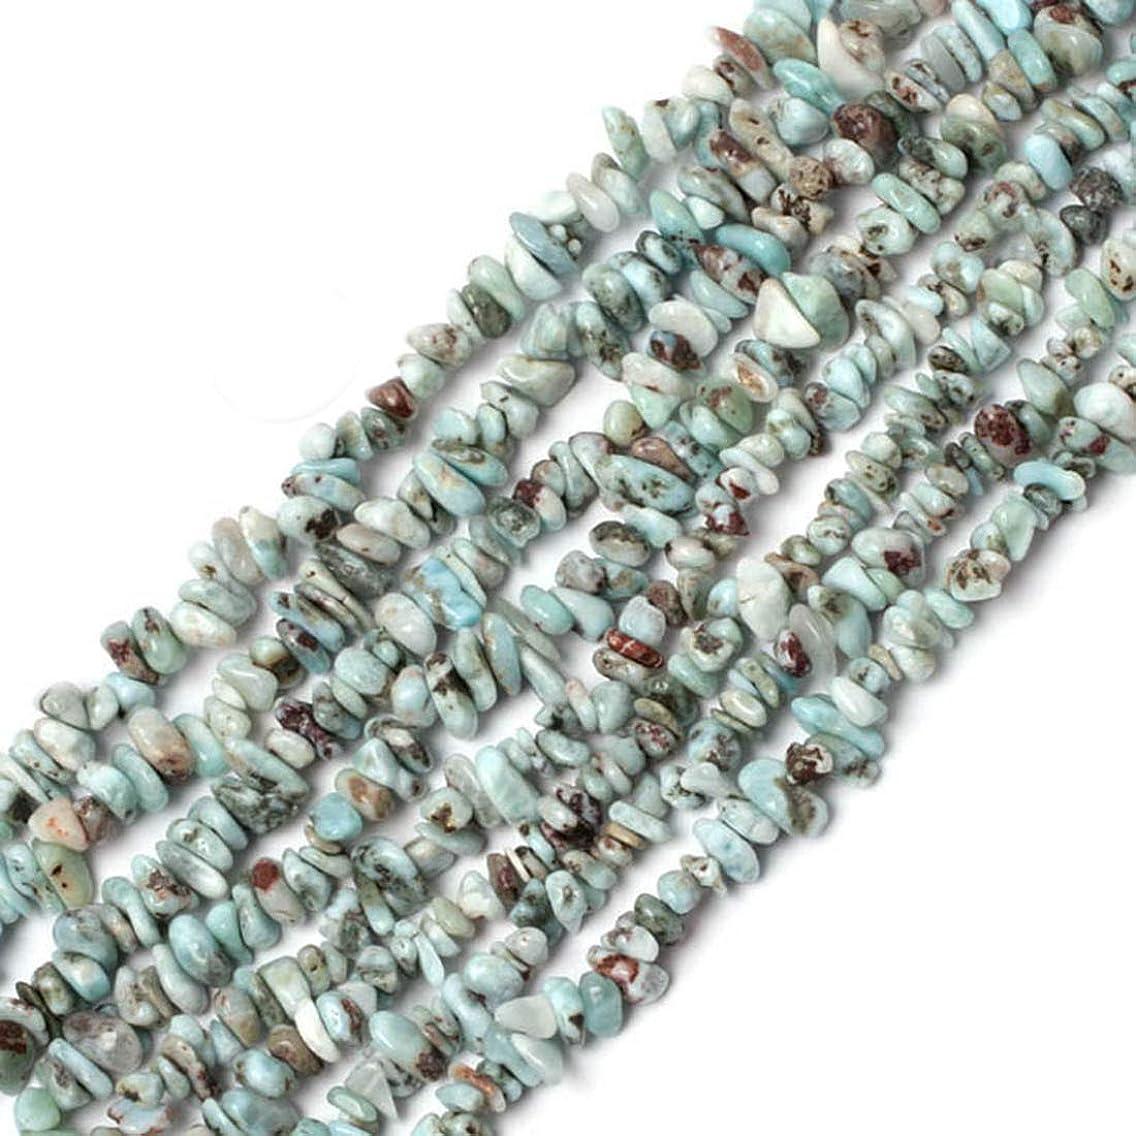 GEM-inside 6-7mm Larimar Chips Beads Strand Freeform Handmade Beads for Jewelry Making Jewelry Beading Supplies for Women